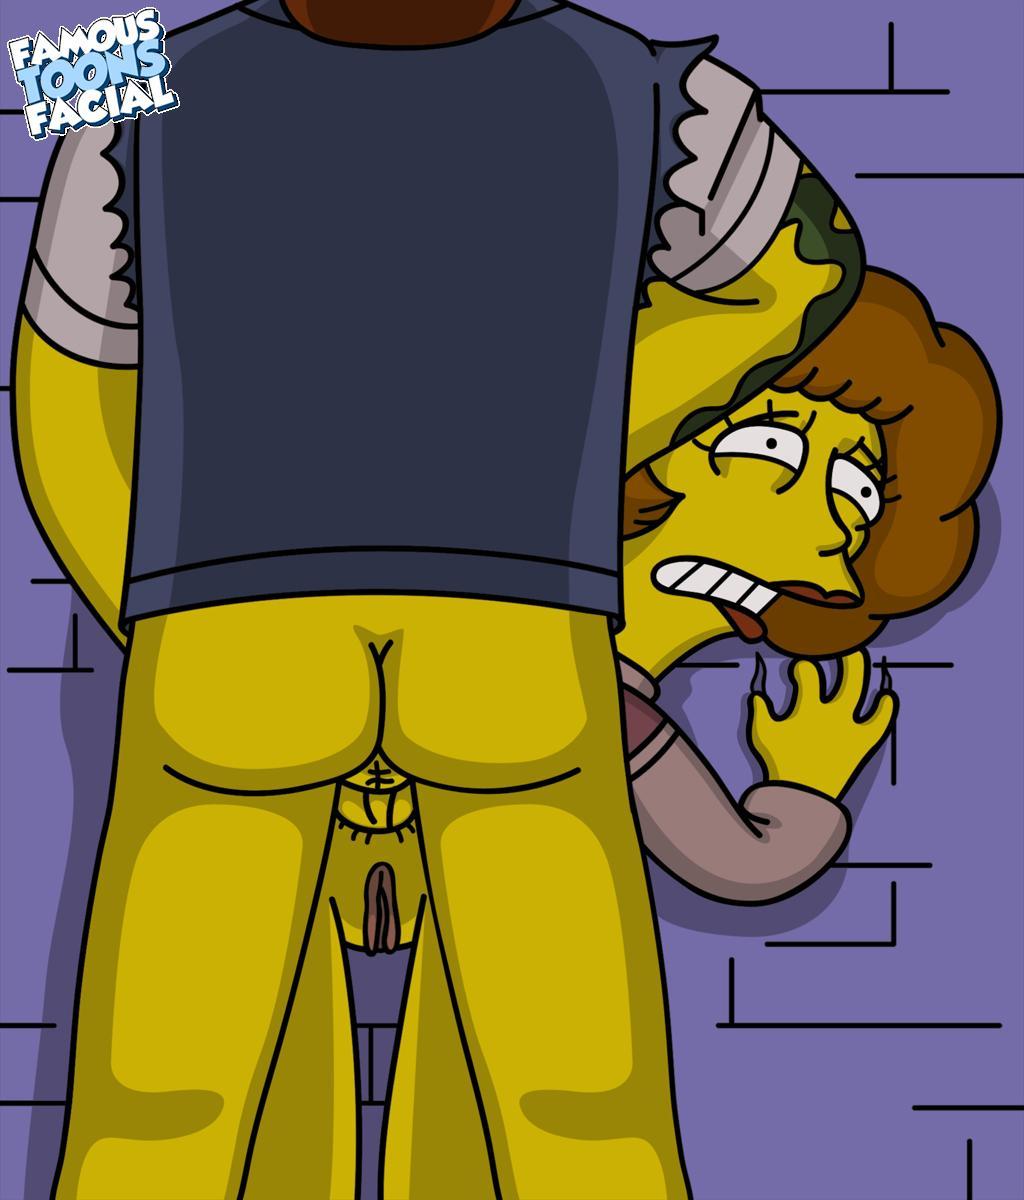 Bdsm exekution 3d porn anime bizarre girls